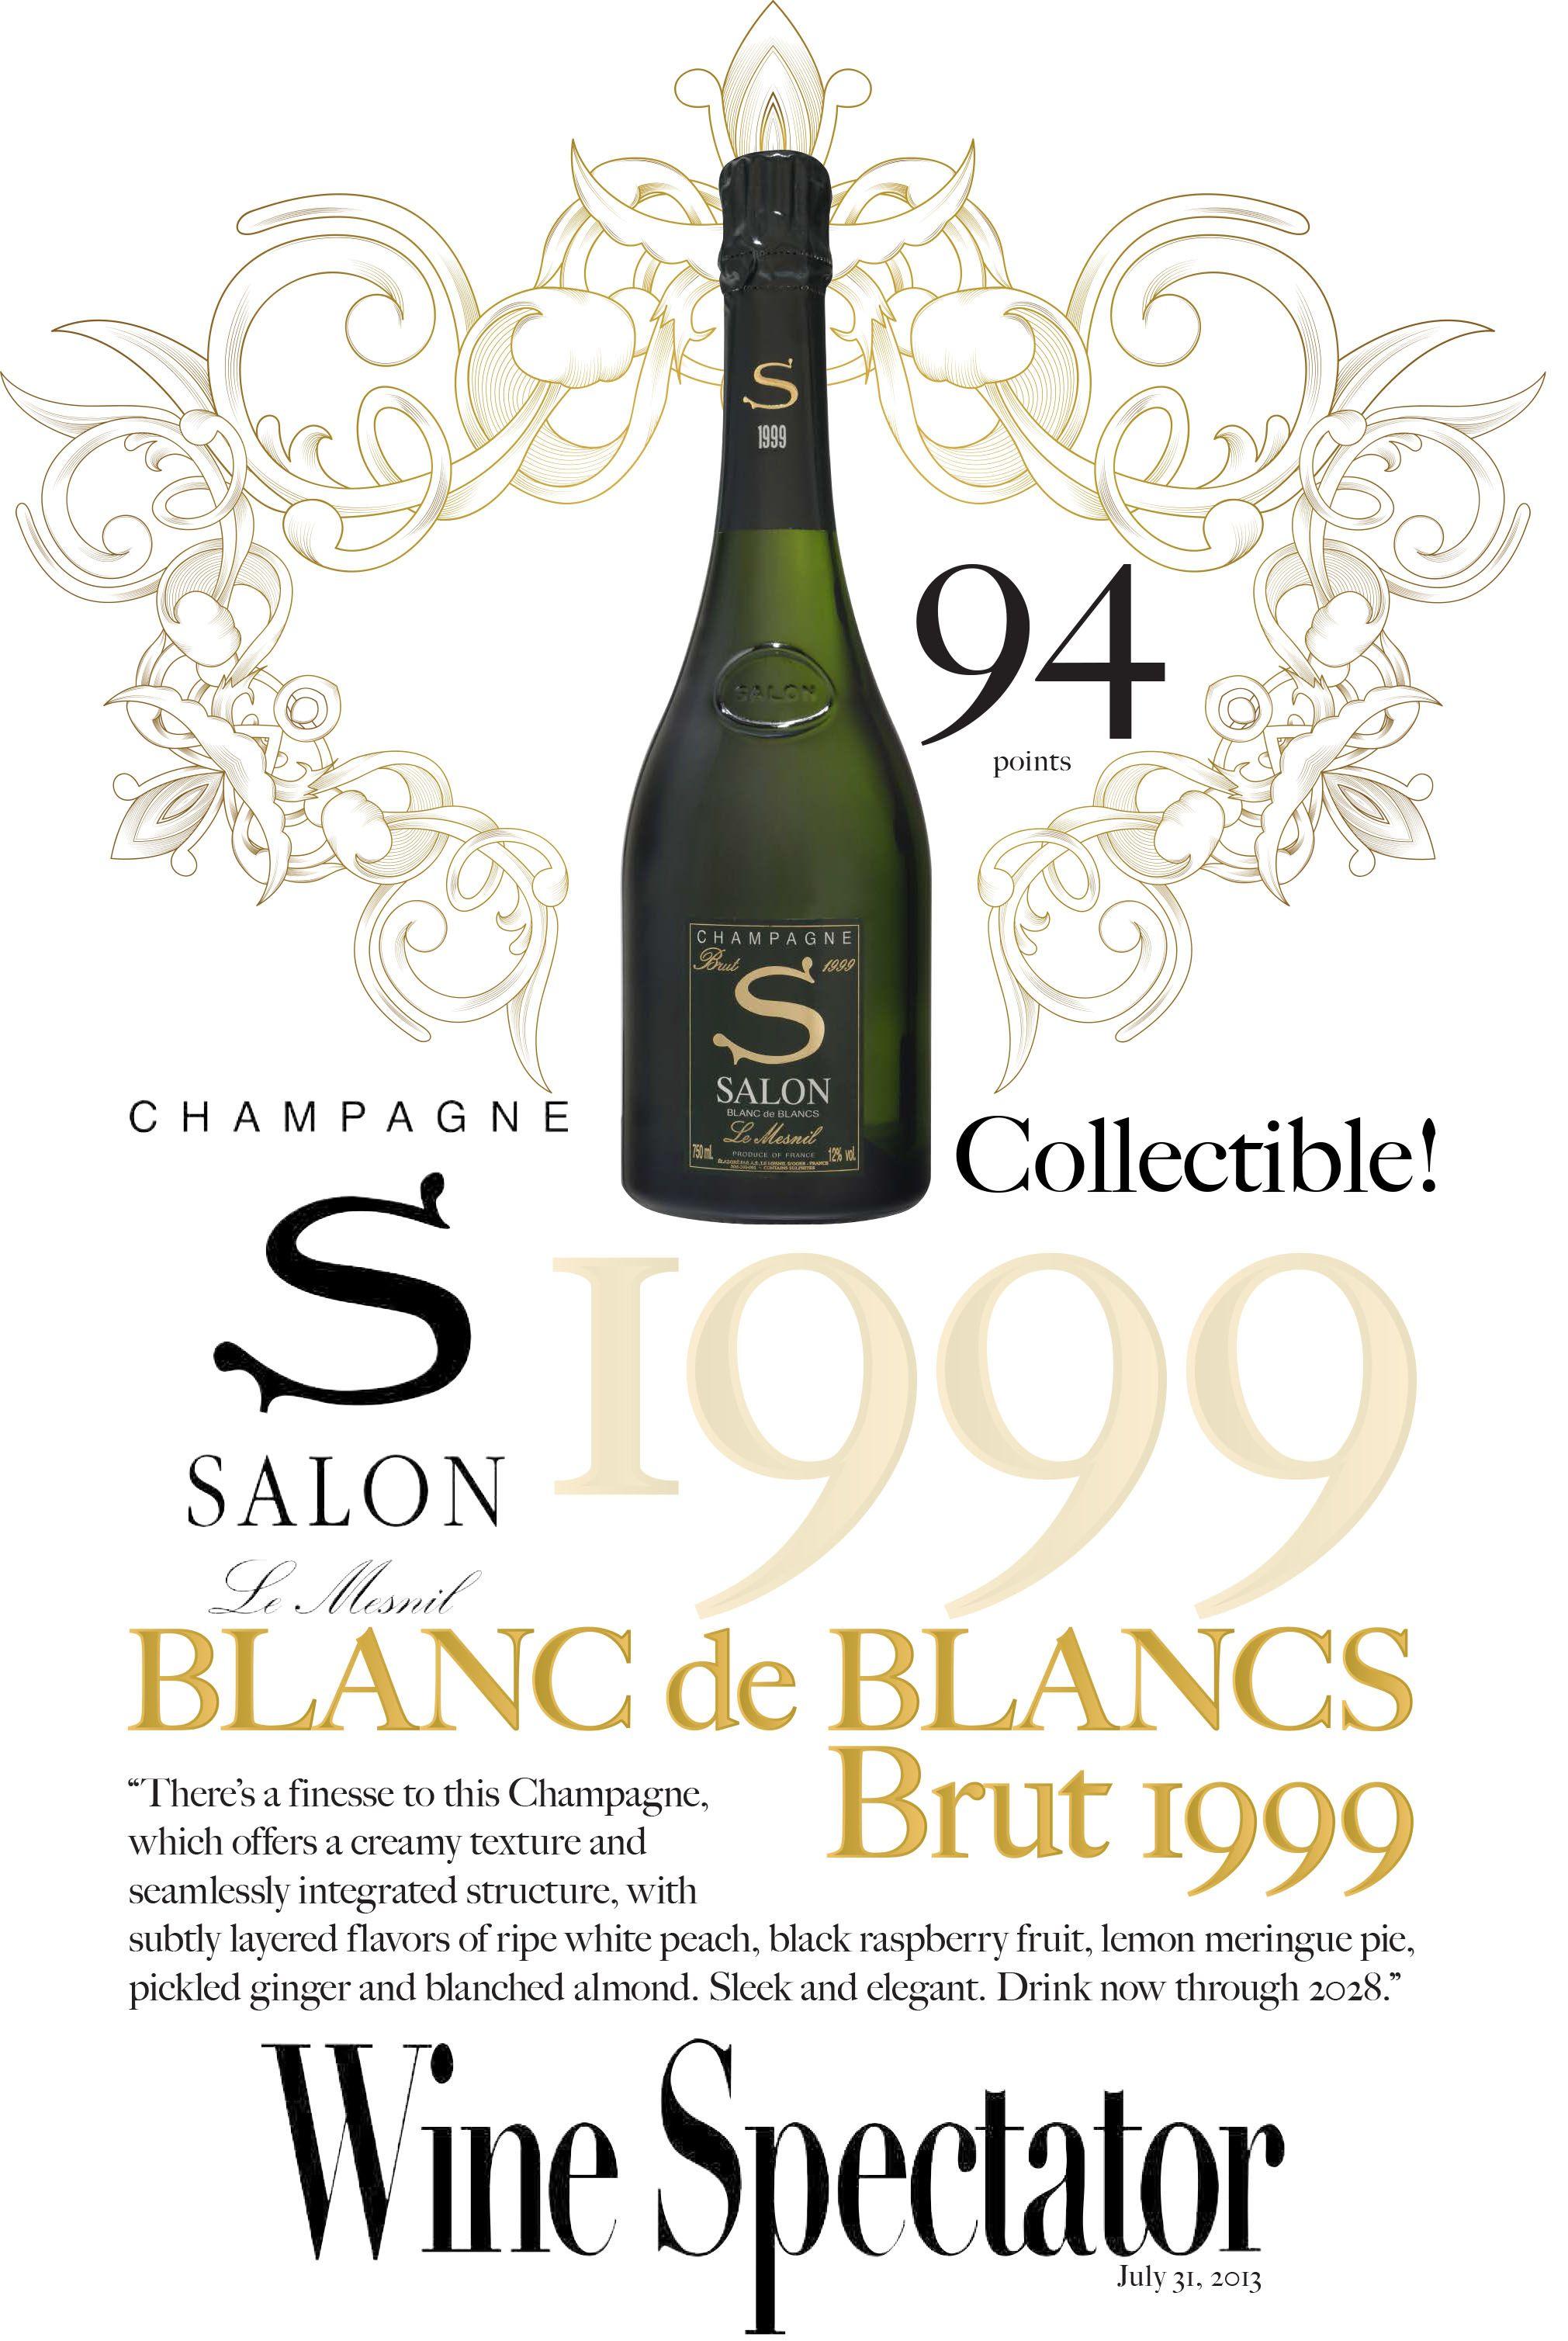 Champagne Salon Blanc de Blancs Brut 1999 - Wine Spectator - 94 ...